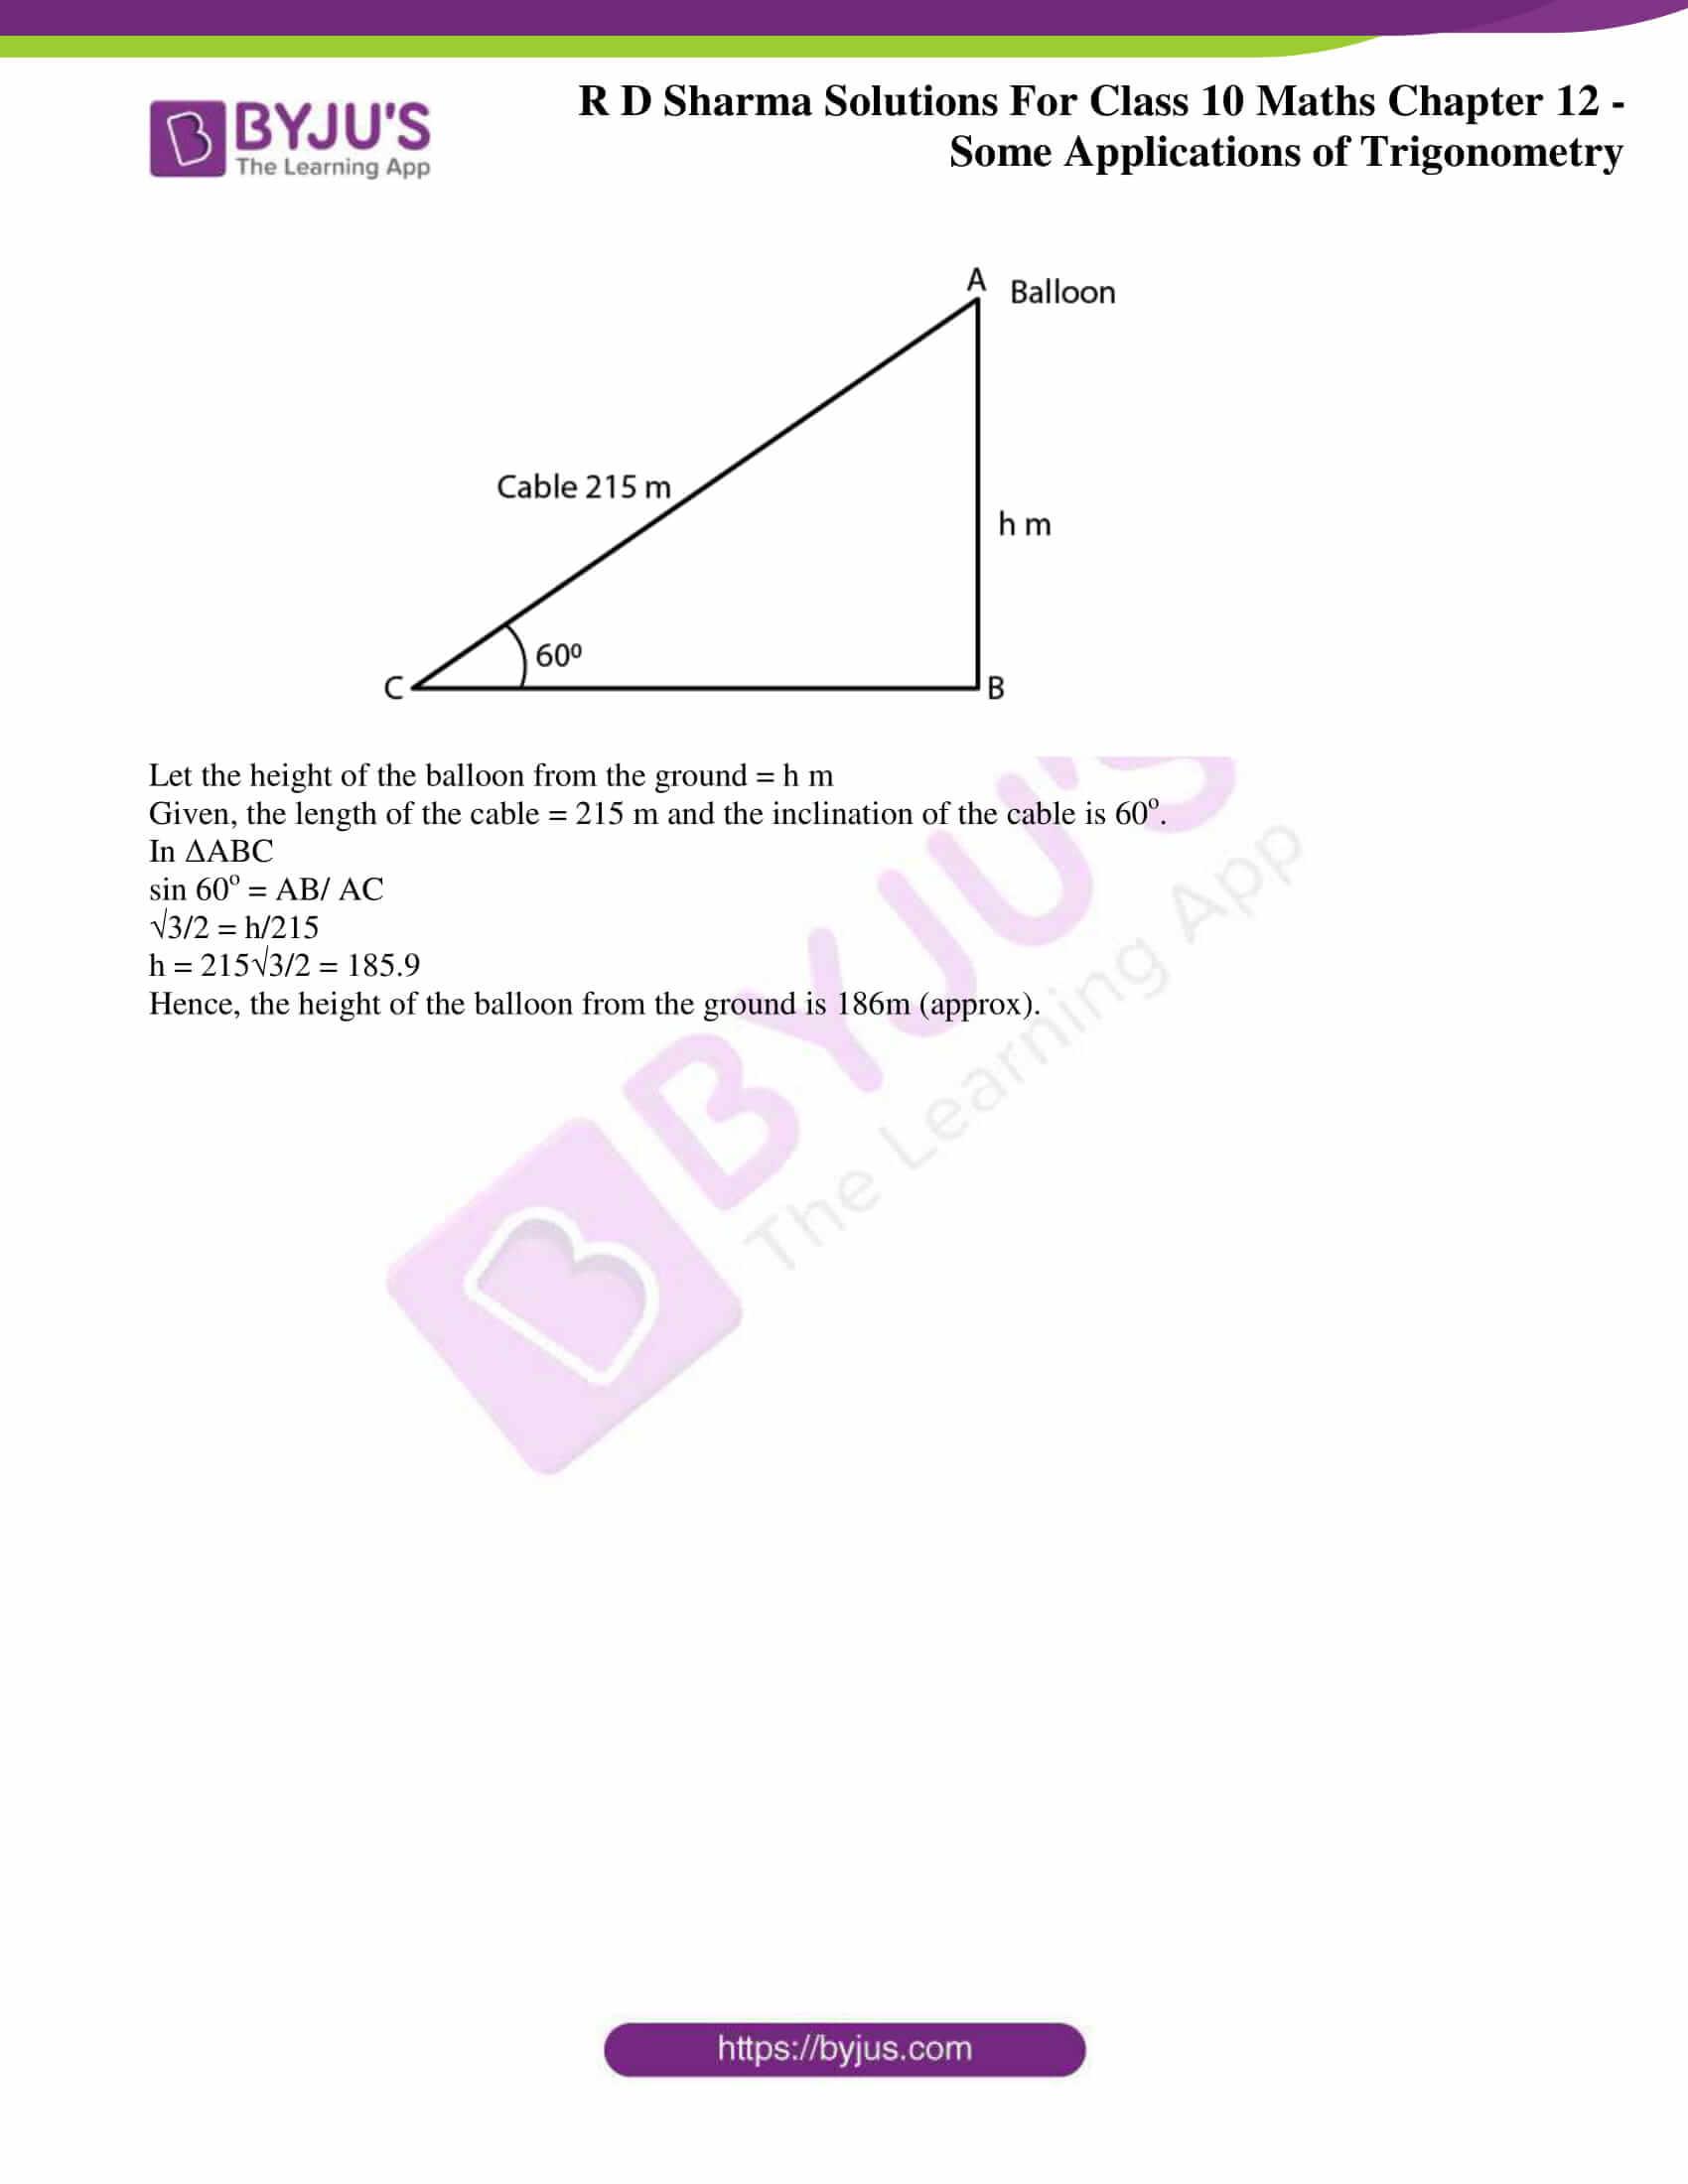 rd sharma class 10 chapter 12 applications trigonometry solutions 36